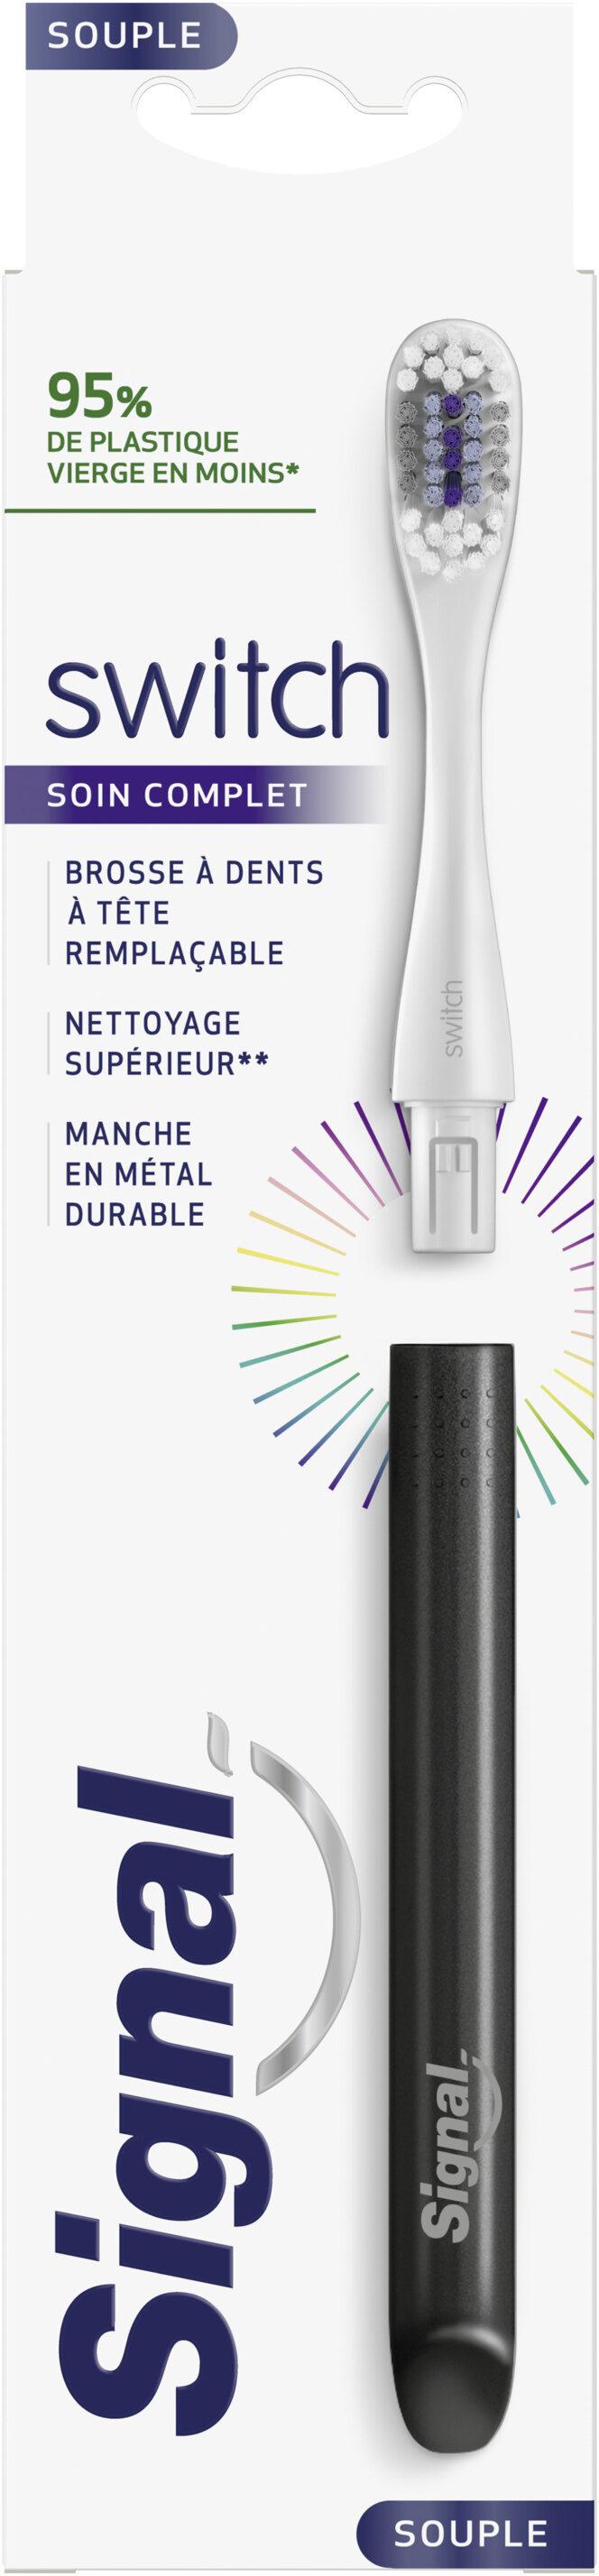 Signal Brosse à Dents Tête Remplaçables Switch Starter Kit x 1 - Product - fr